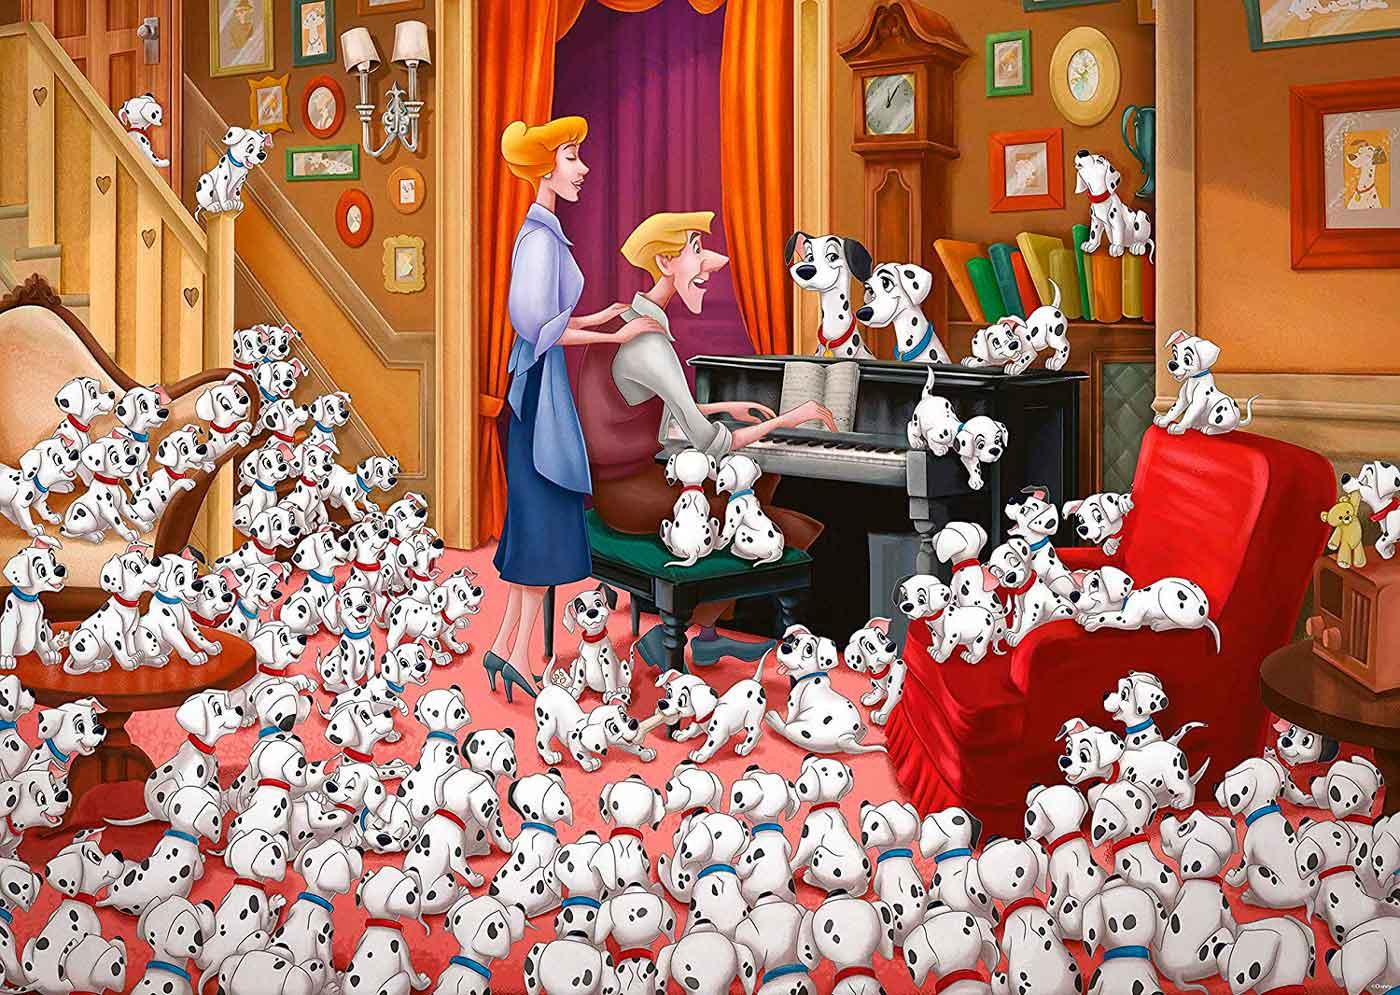 Puzzle Ravensburger 101 Dálmatas de 1000 Piezas